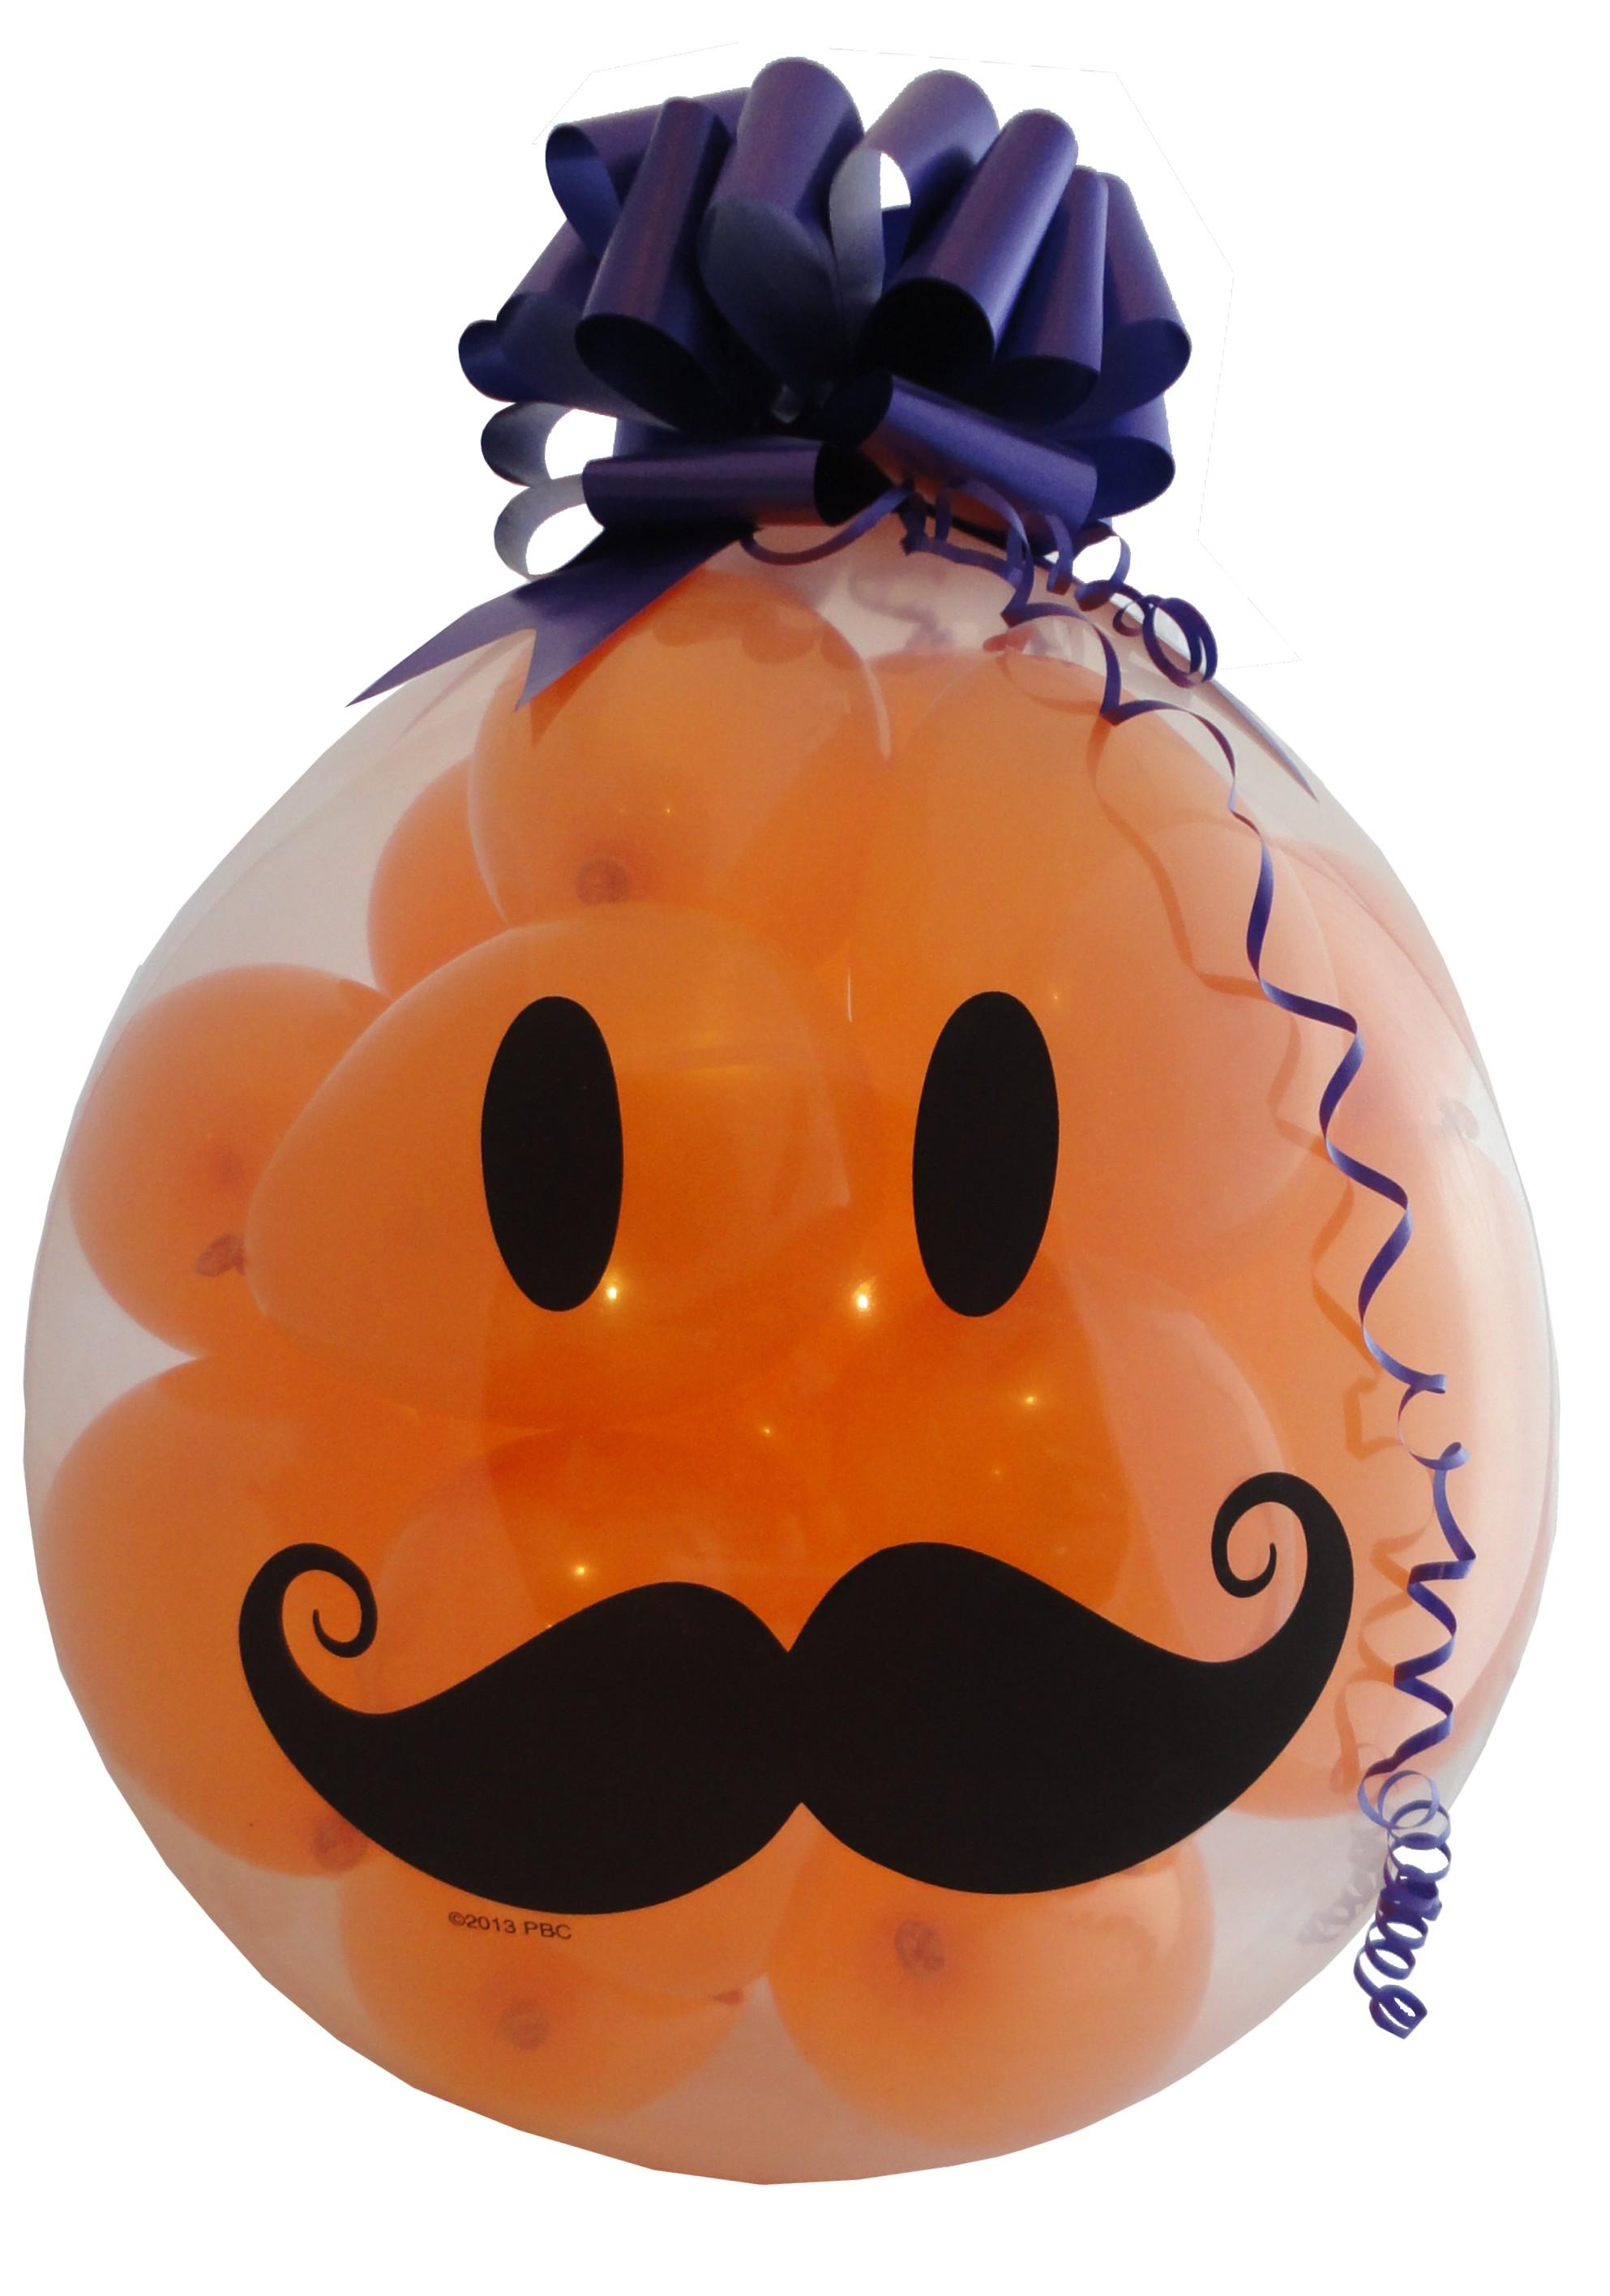 qualatex-18-inch-stuffing-balloon-mustache.jpg